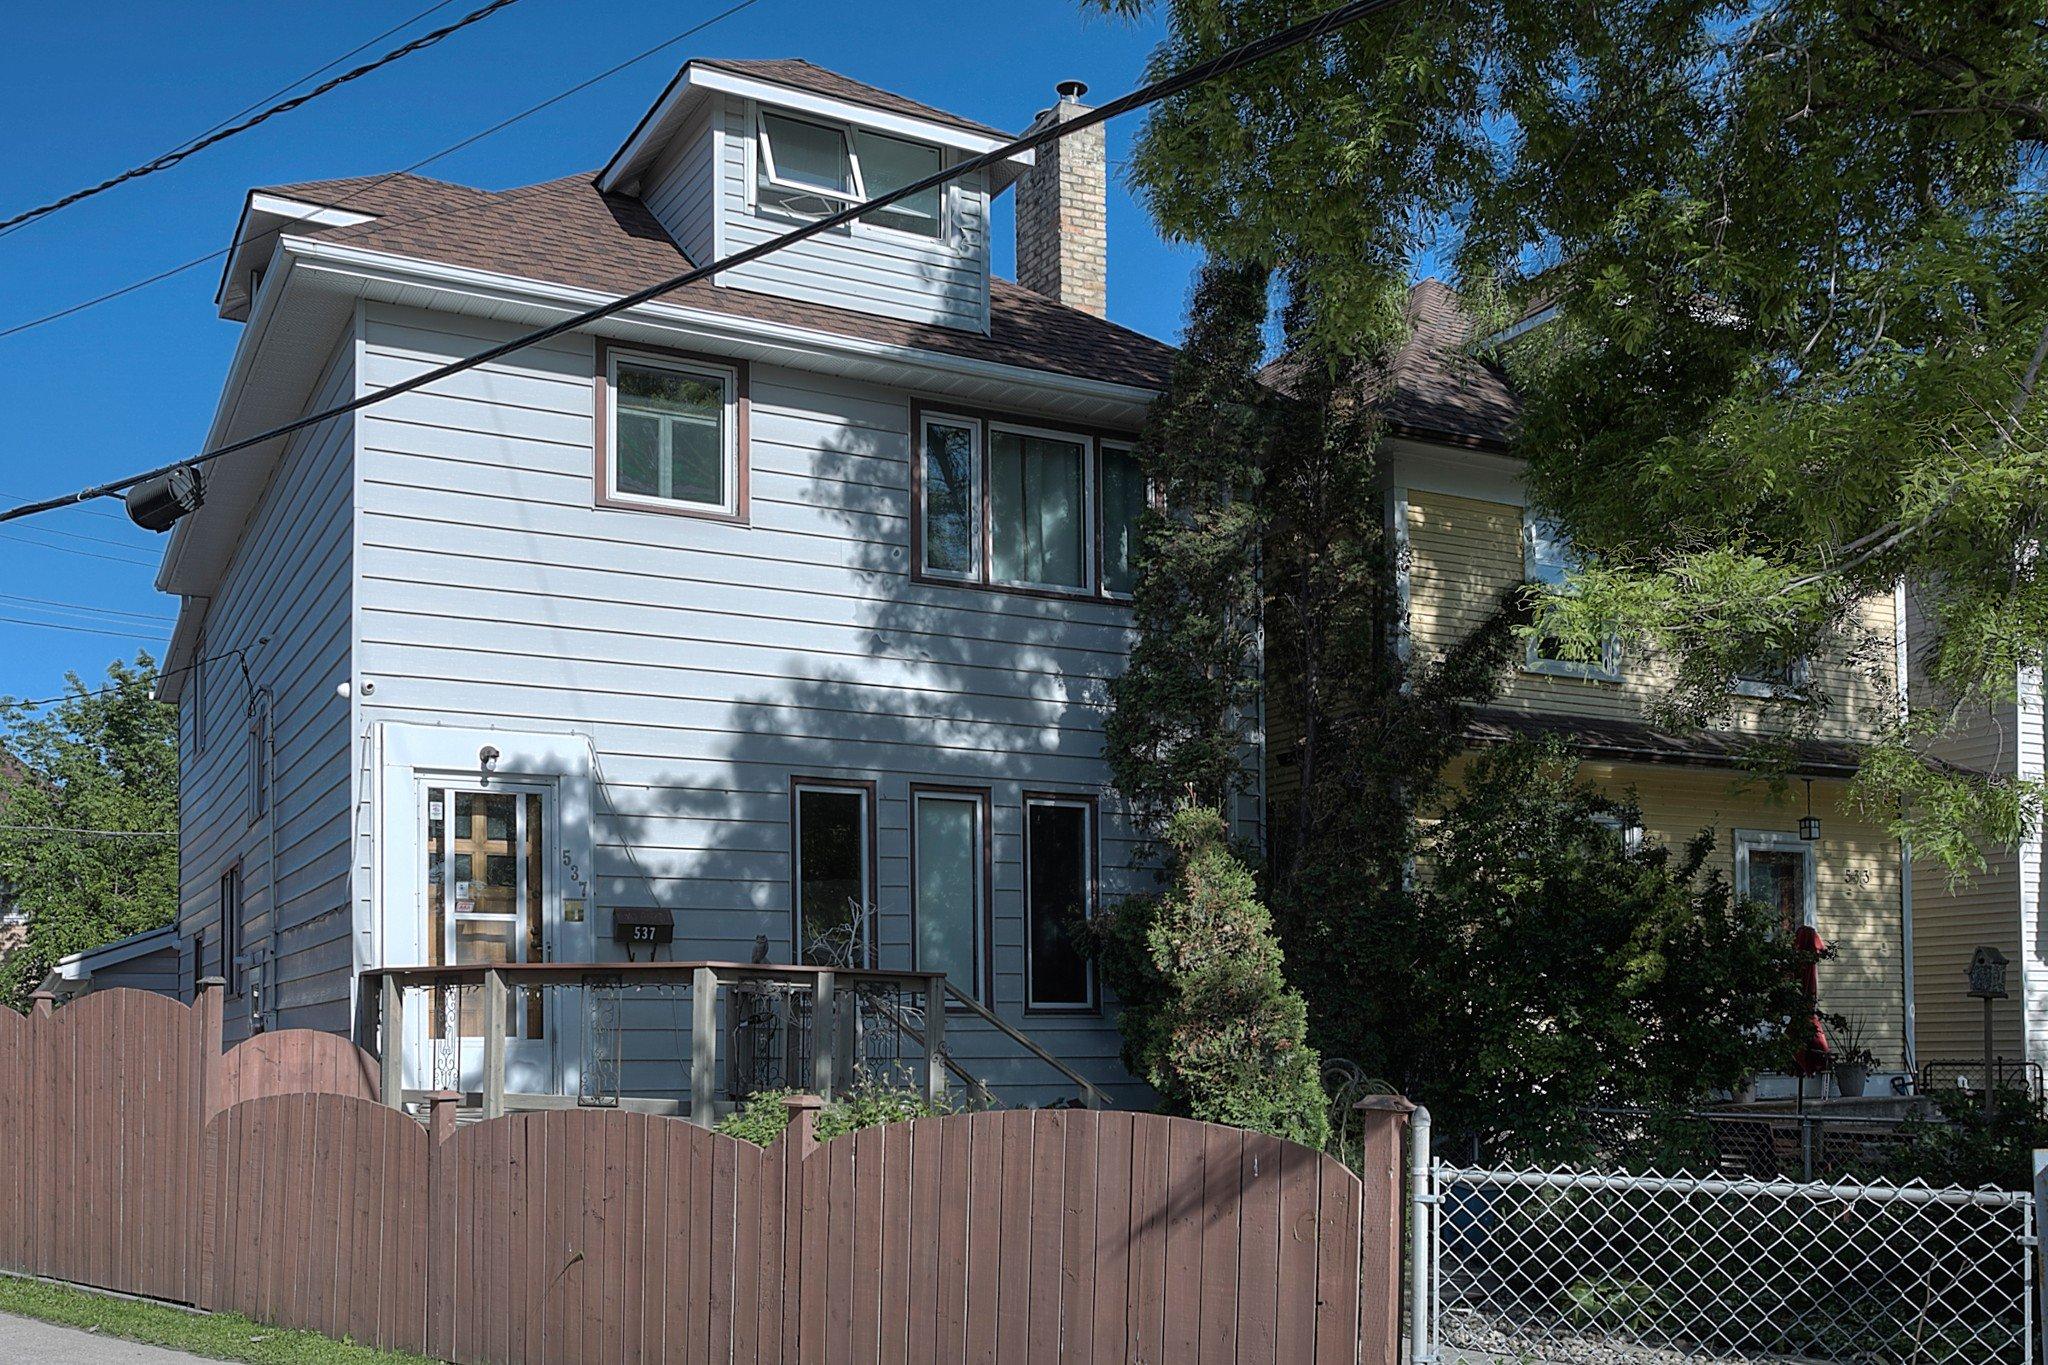 Main Photo: 537 Stiles Street in Winnipeg: Single Family Detached for sale (5B)  : MLS®# 202013715